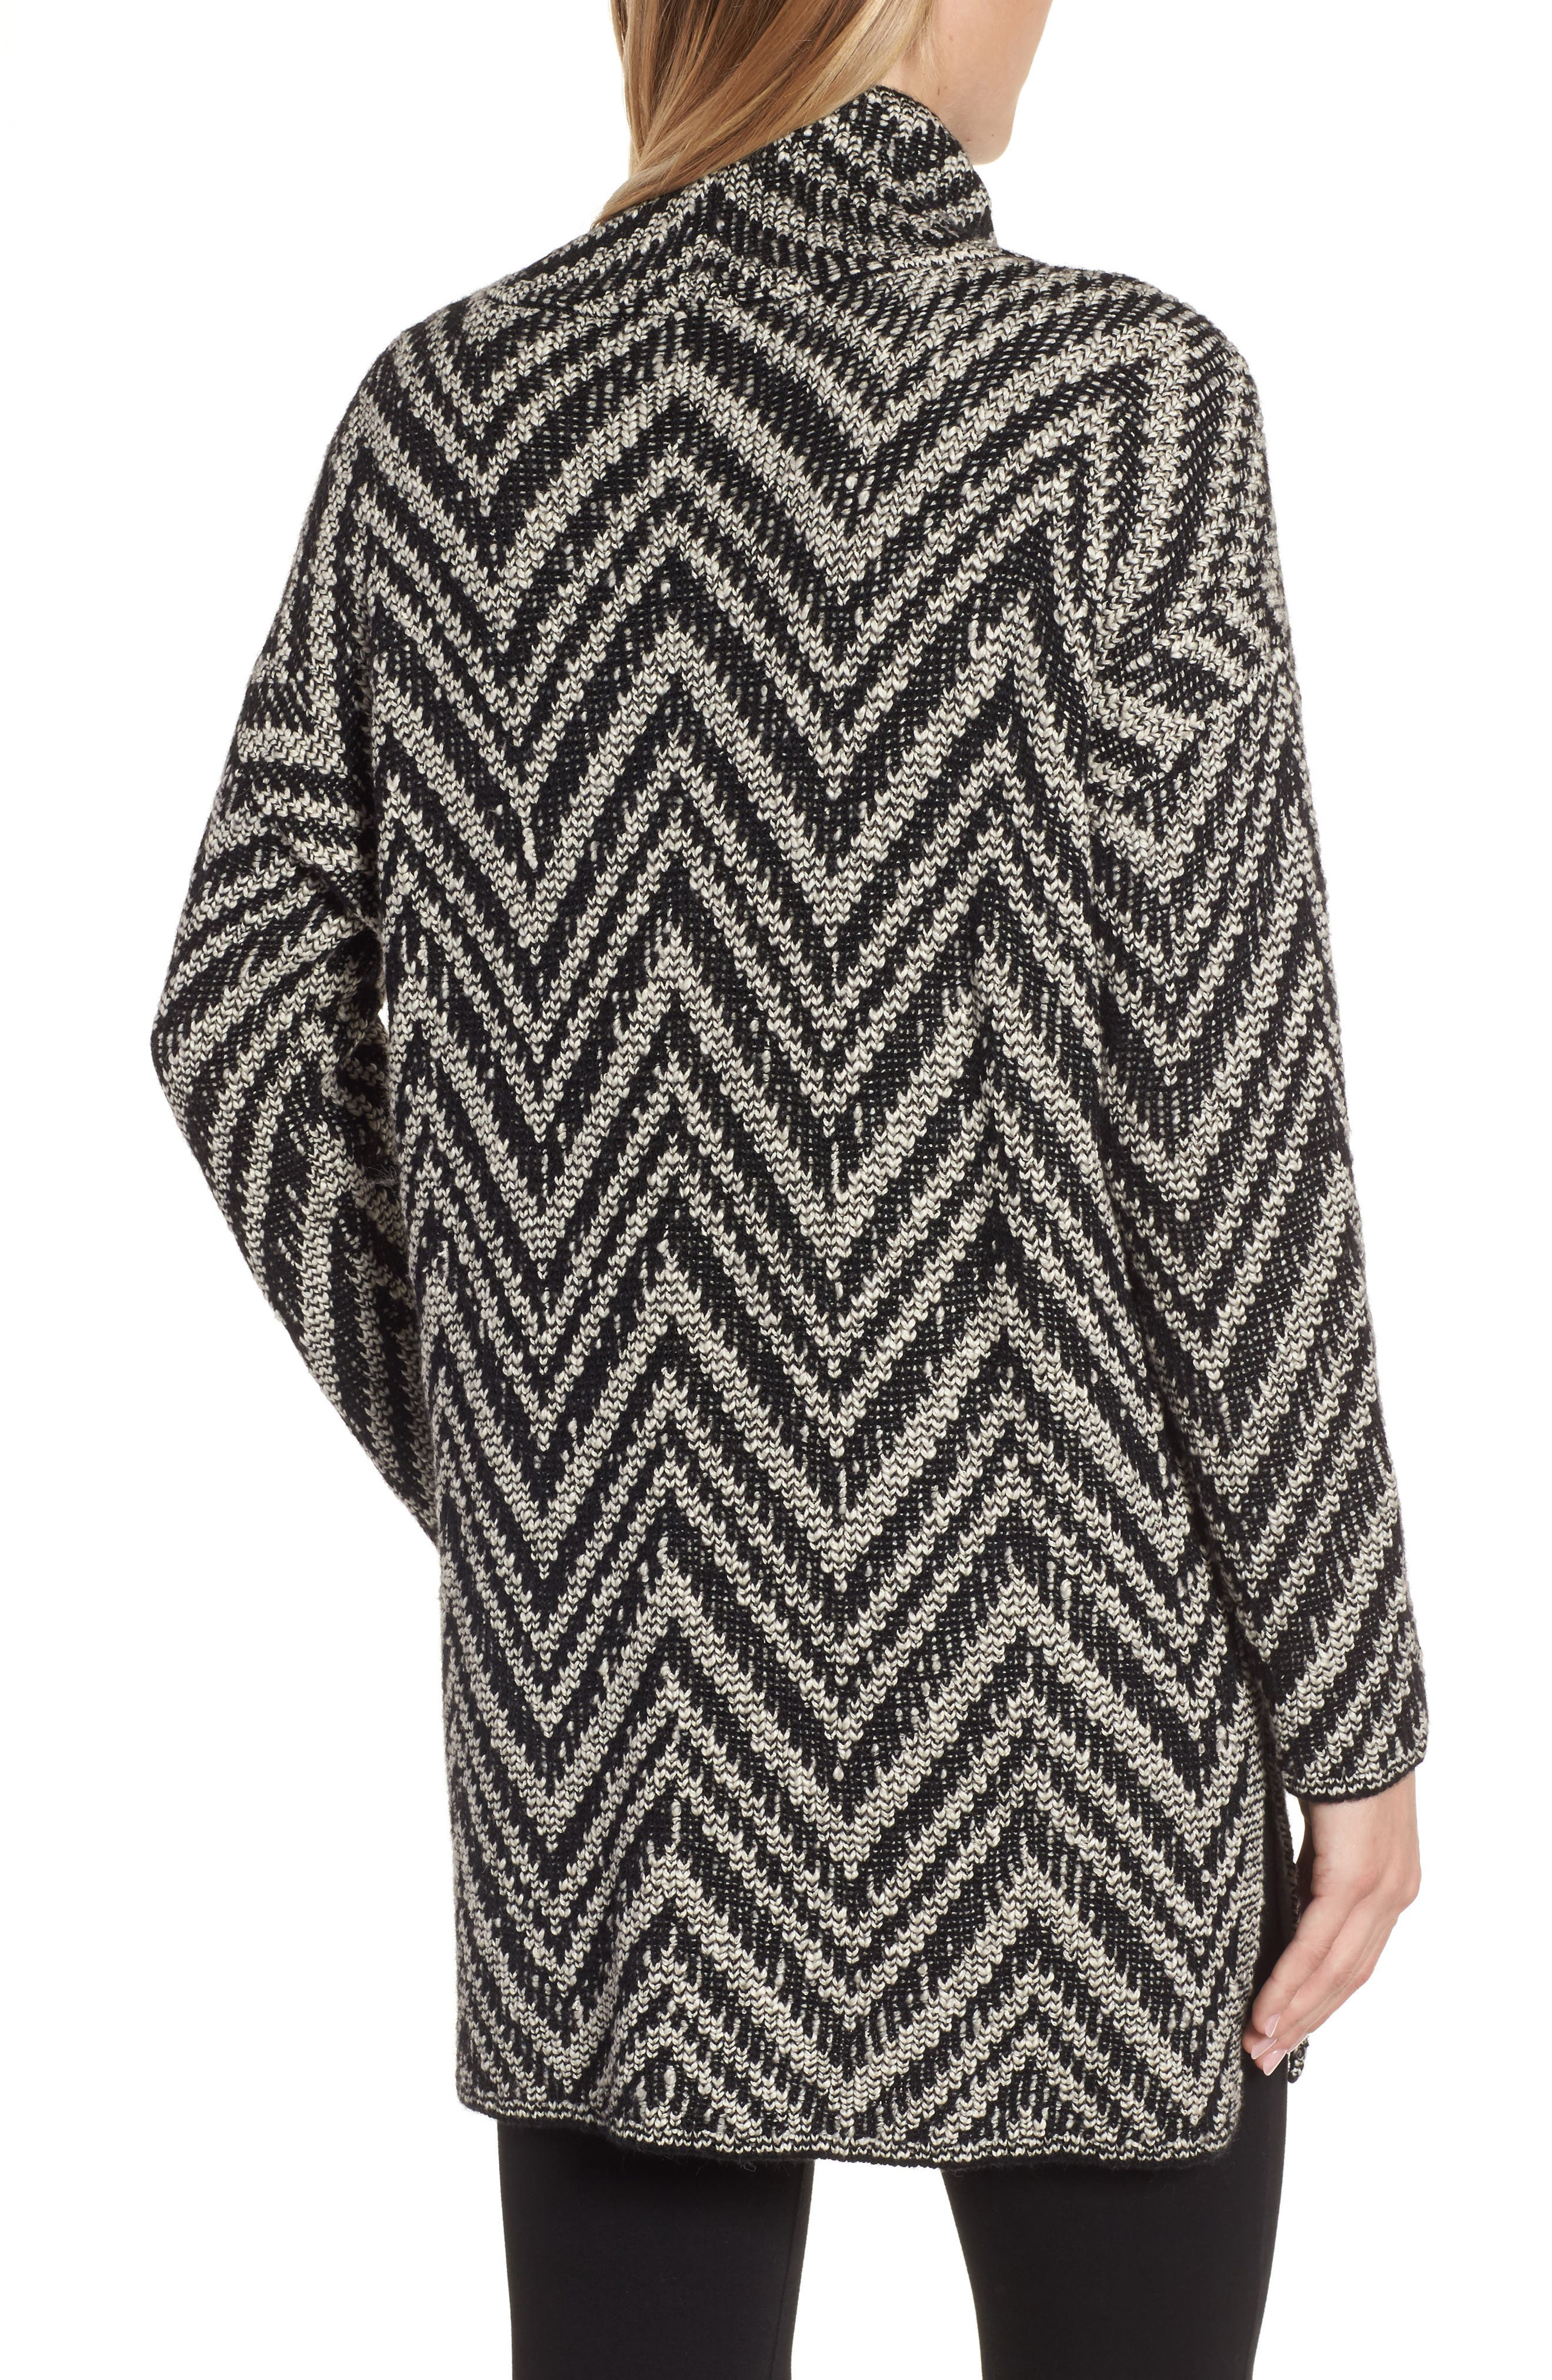 Zigzag Organic Cotton & Alpaca Tunic Sweater,                             Alternate thumbnail 2, color,                             Black/ Soft White